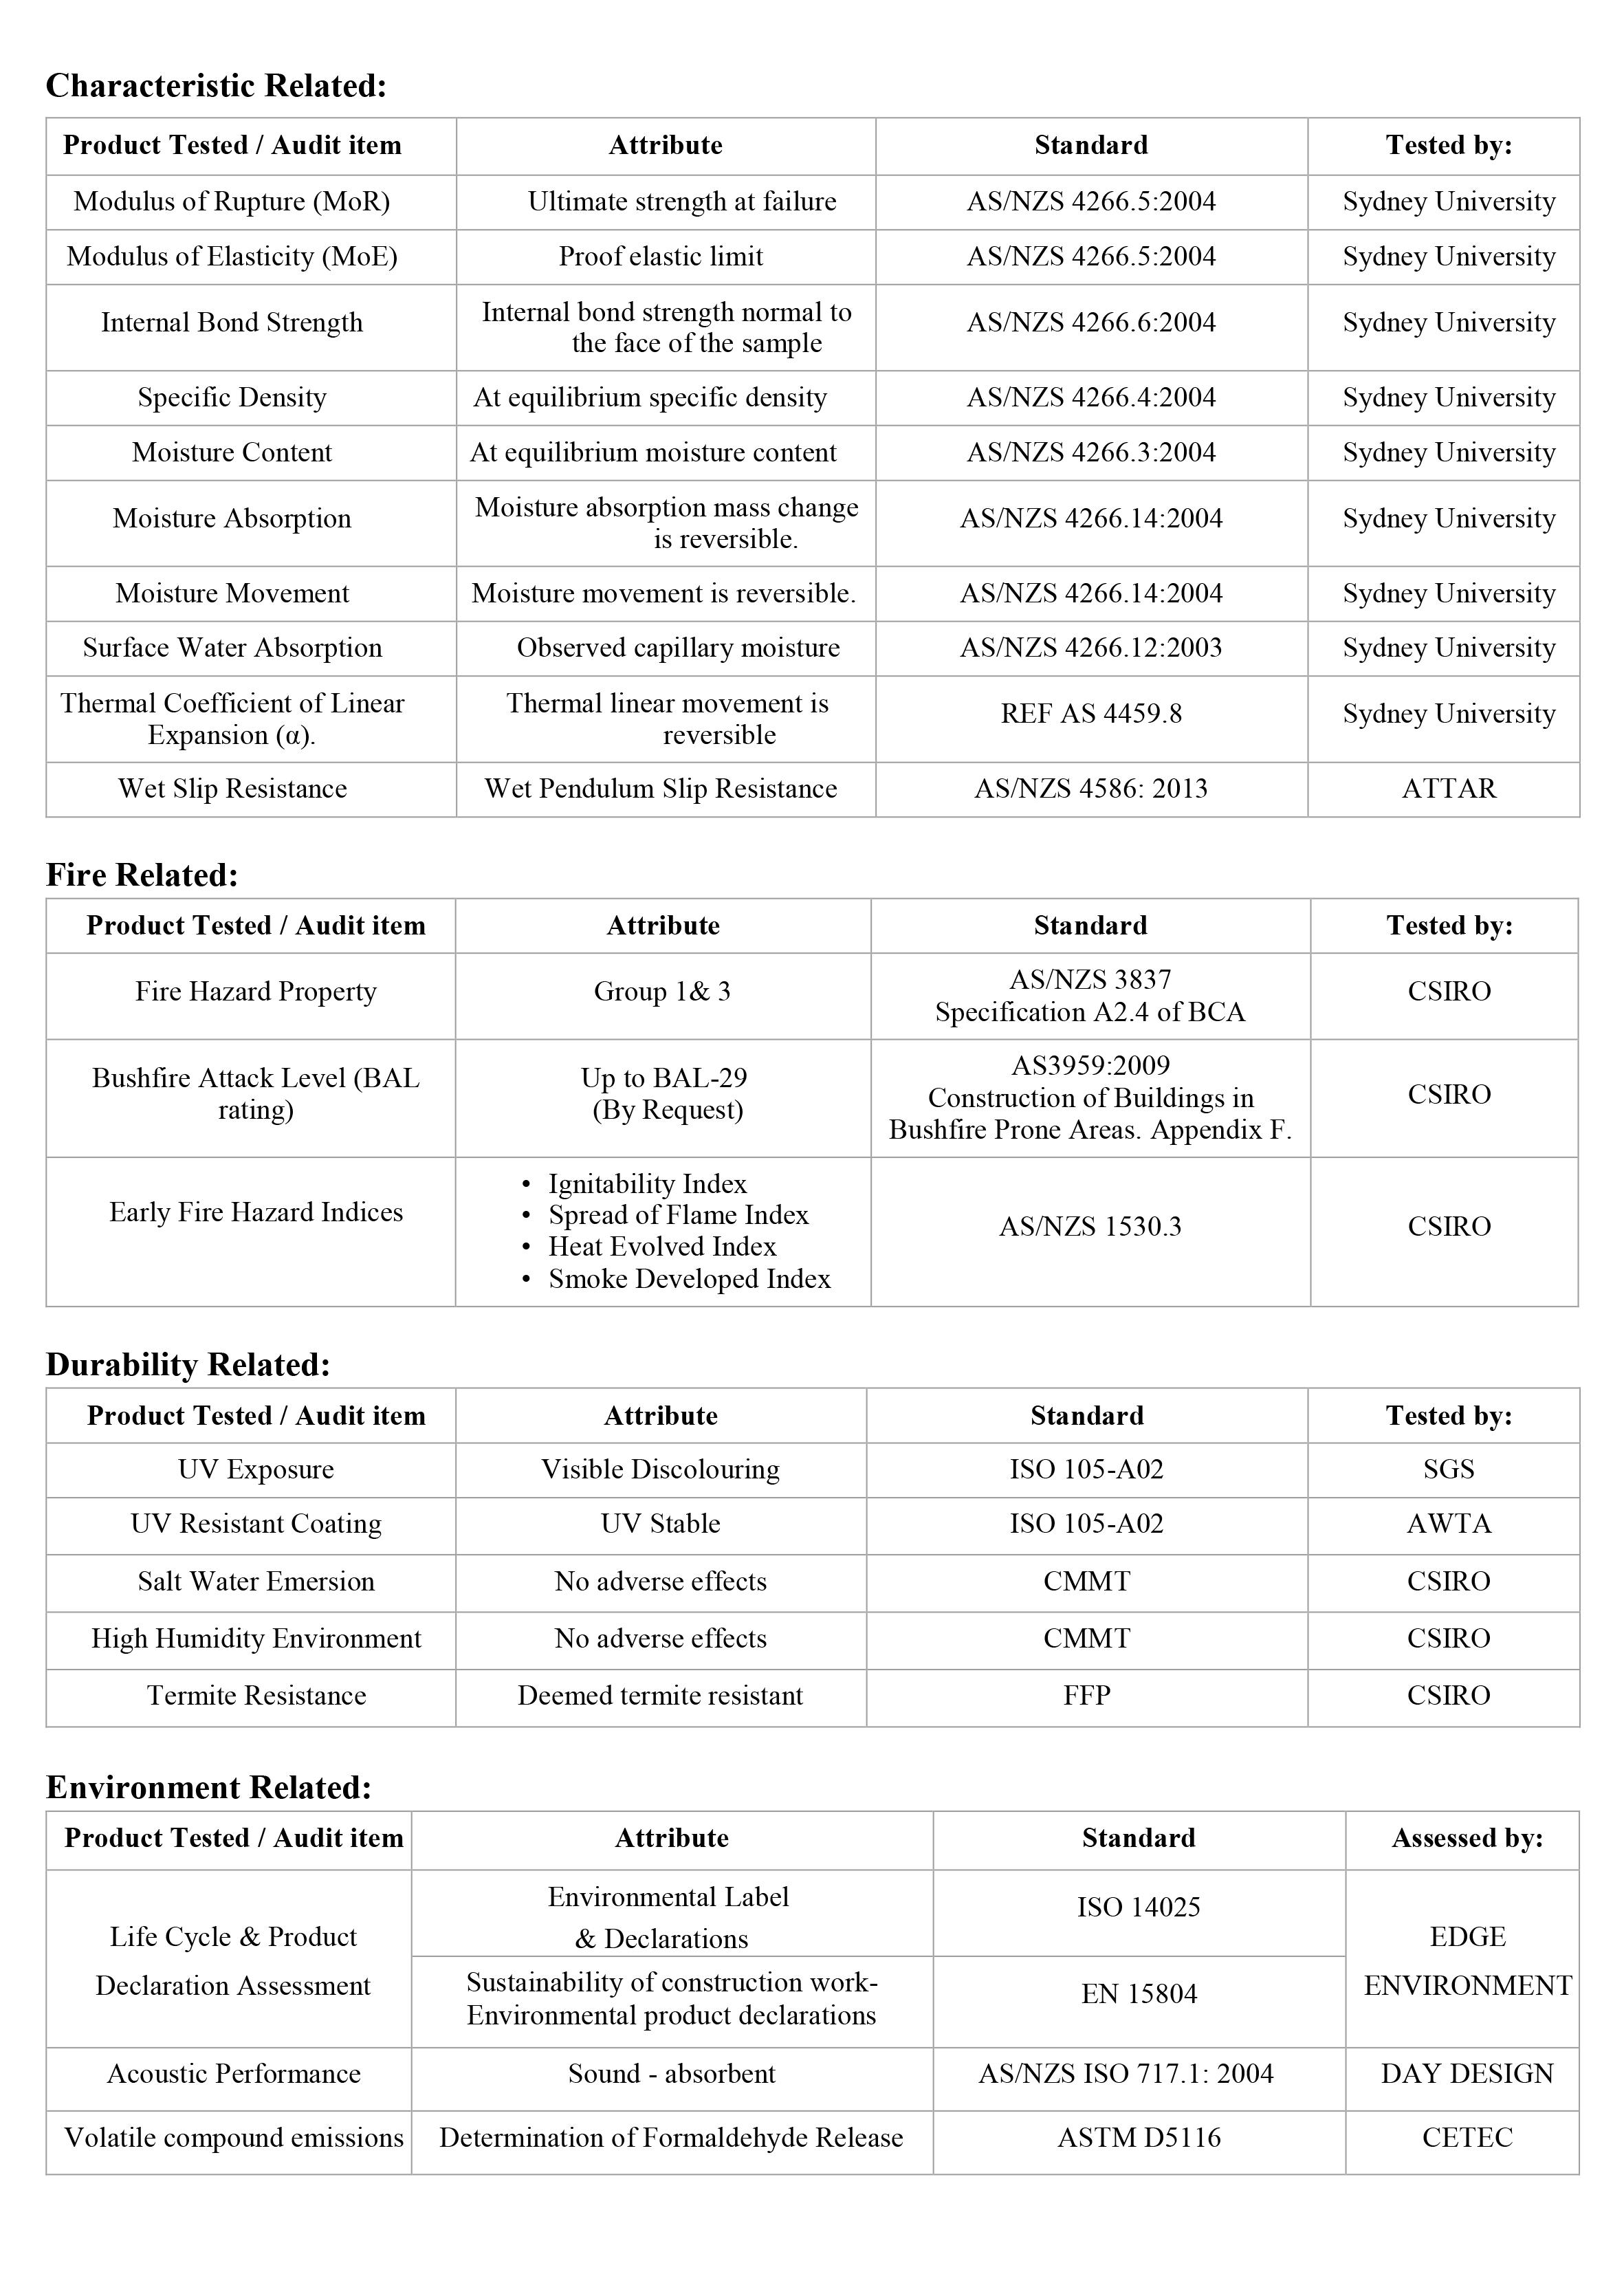 Innowood-Verification Report-2016V3